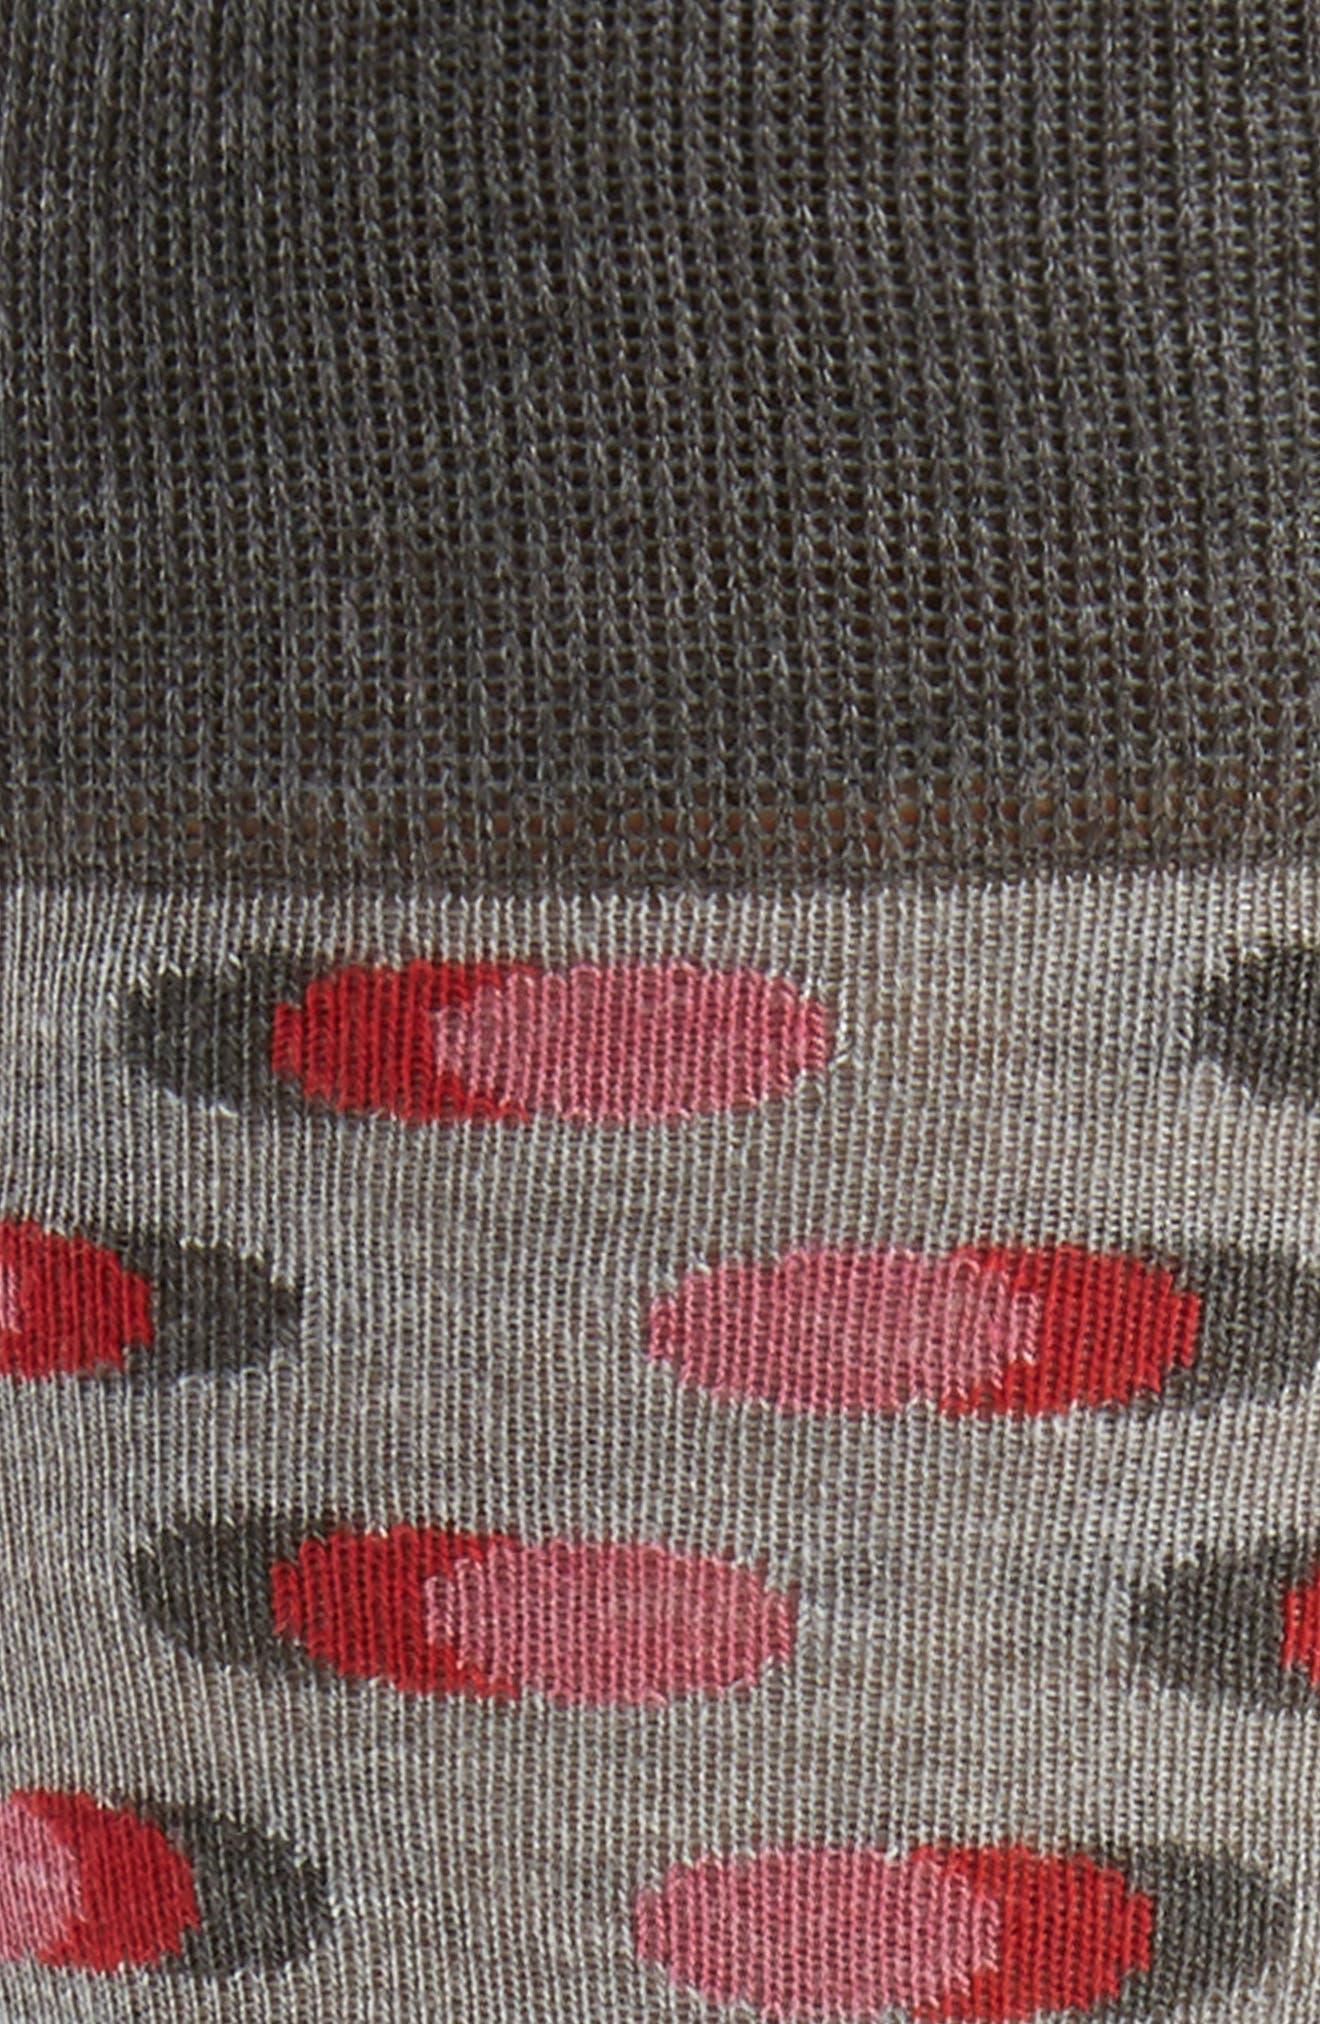 Alternate Image 2  - Calibrate Dot Socks (3 for $30)